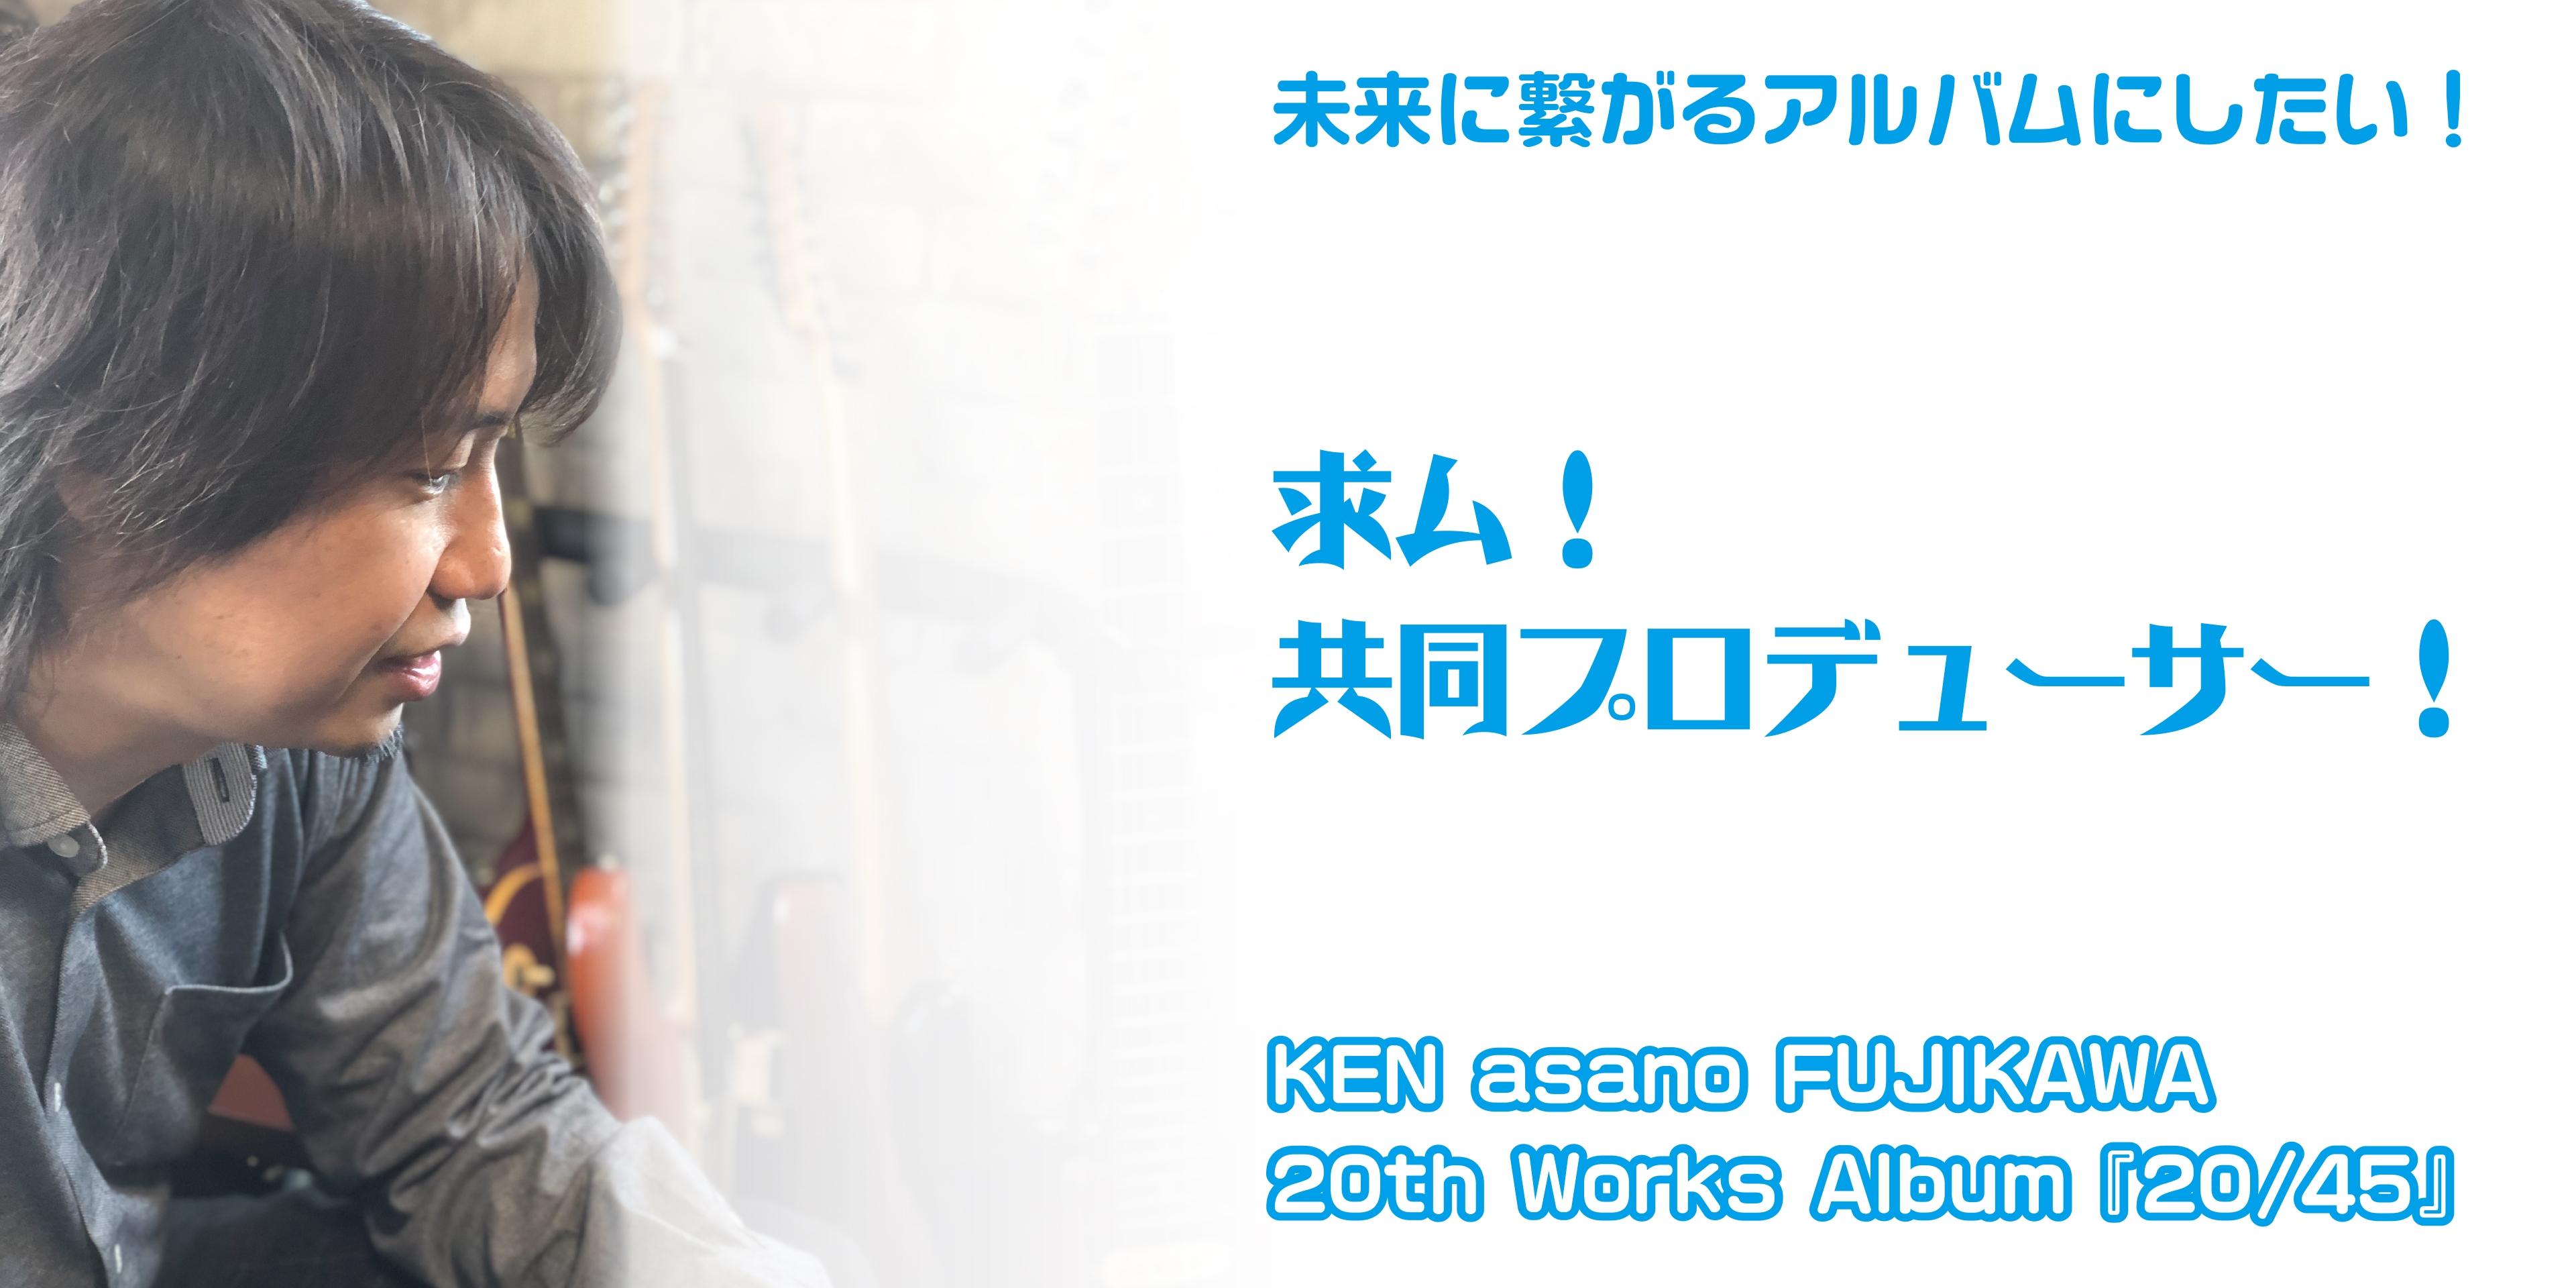 KEN asano FUJIKAWA 20周年ワークスアルバム『20/45』